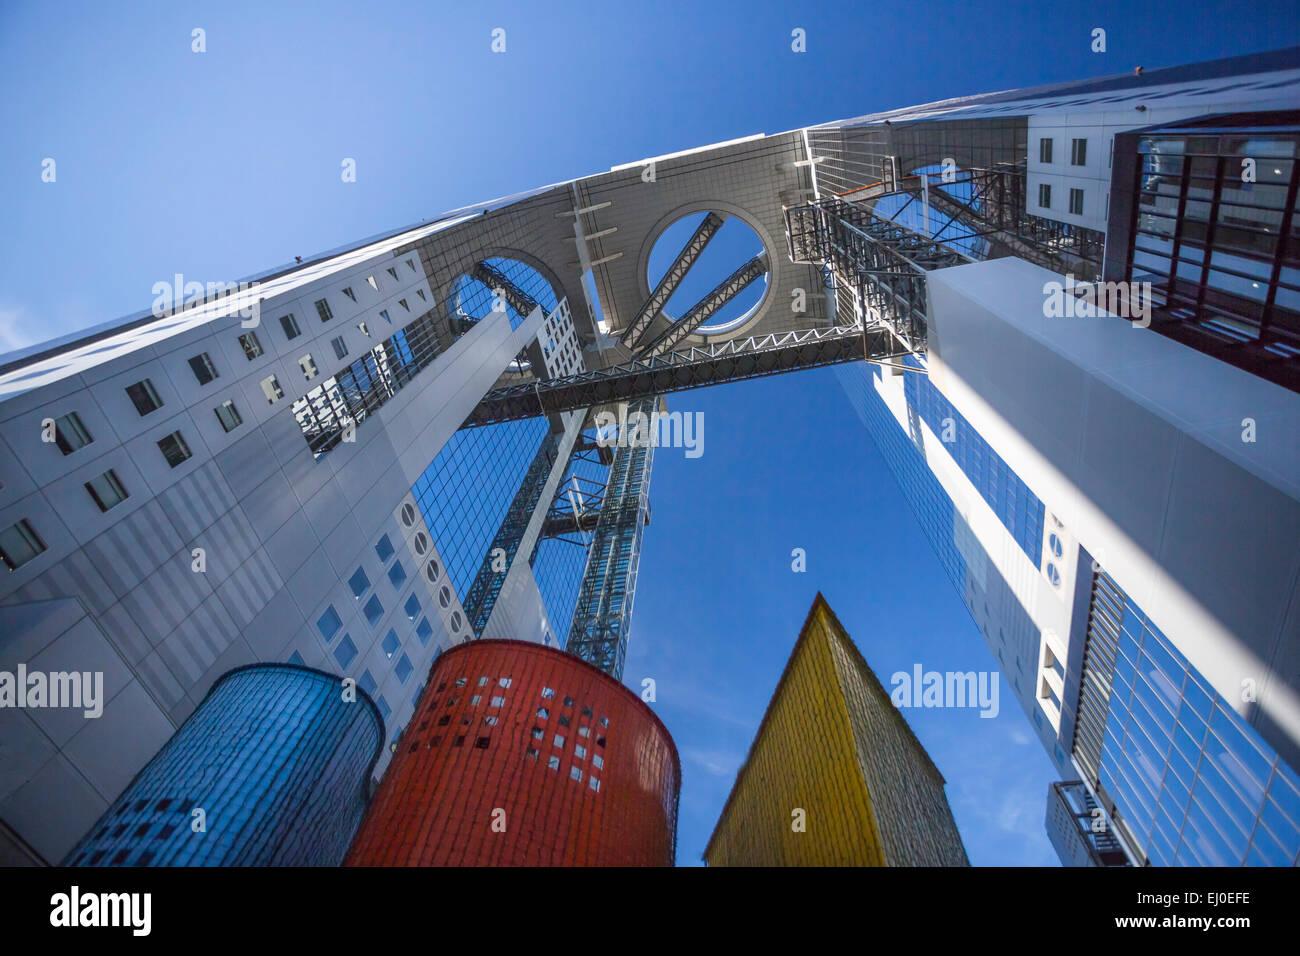 City, Japan, Asien, Kansai, Osaka, Stadt, Umeda Sky, Gebäude, Architektur, bunte, touristische, Reisen Stockbild